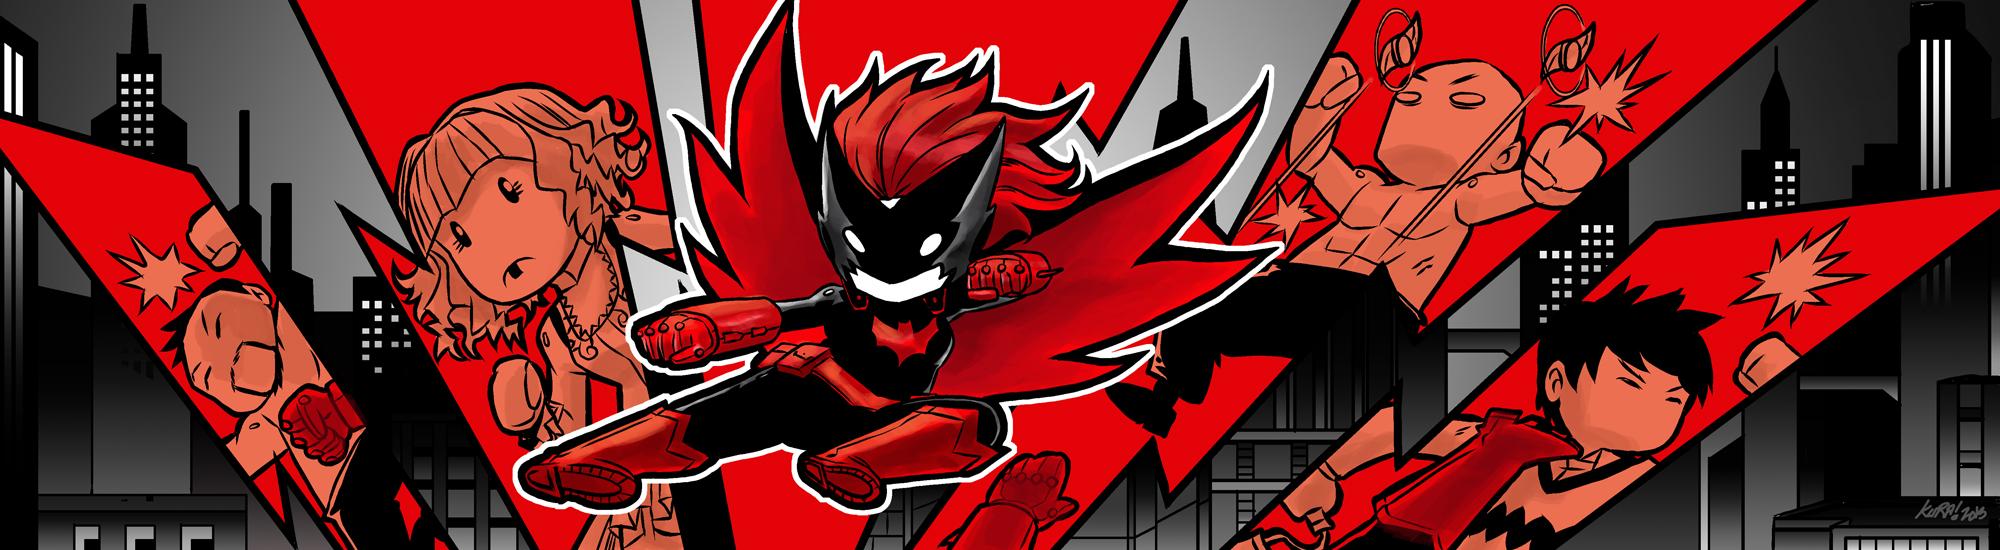 Batwoman by Kurasato